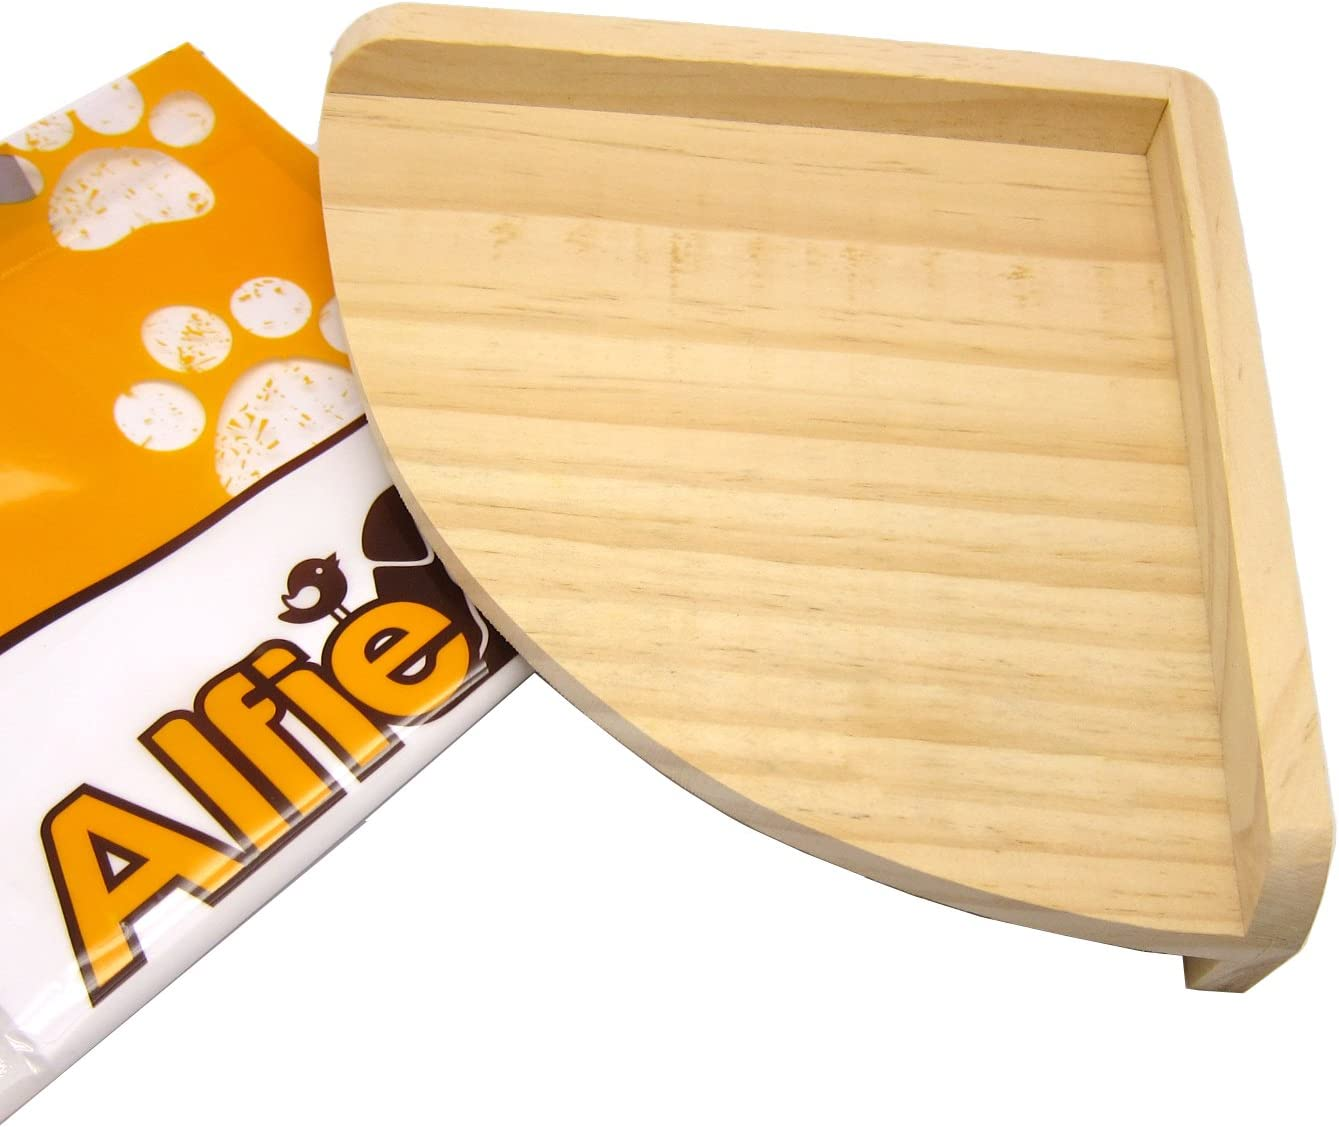 Alfie Pet - Nick Wood Corner Platform for Mouse, Chinchilla, Rat, Gerbil and Dwarf Hamster